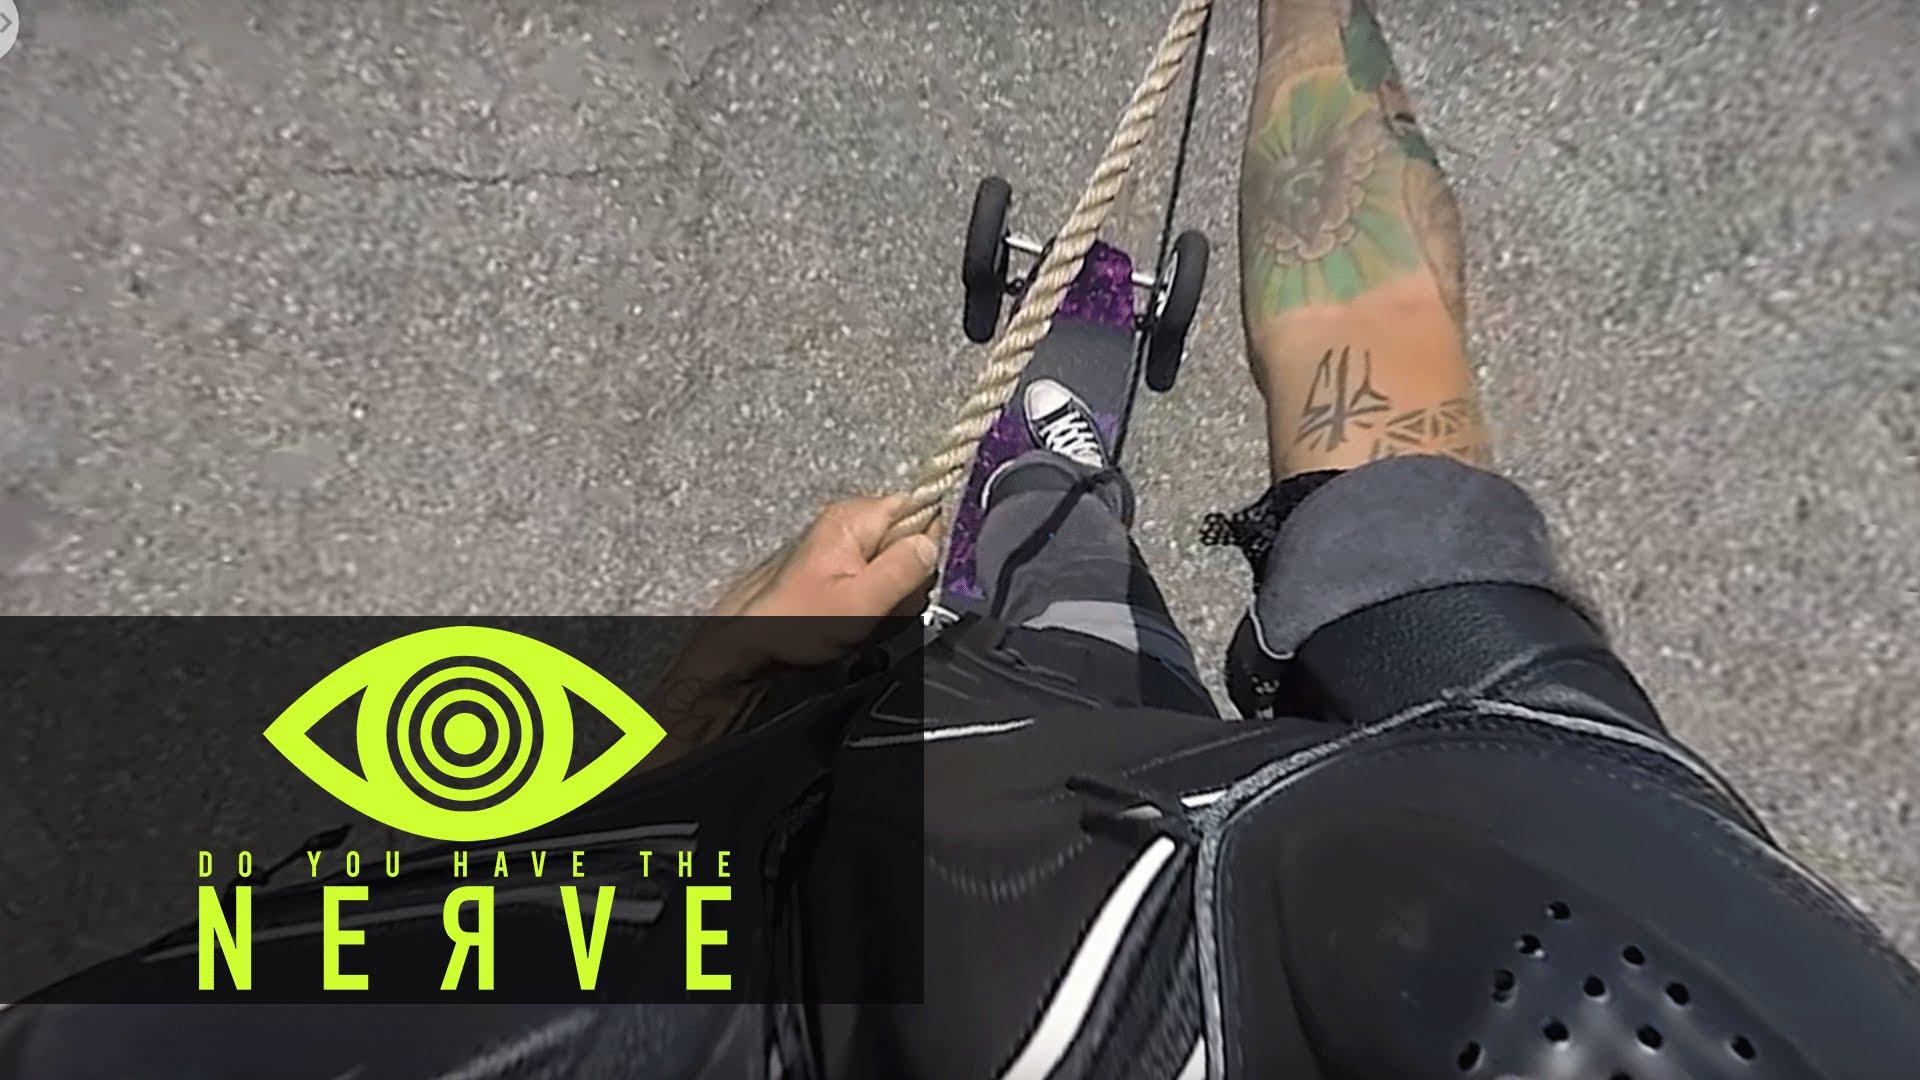 Nerve (2016) 360 Video – VR Dare: Skateboard Behind A Cop Car